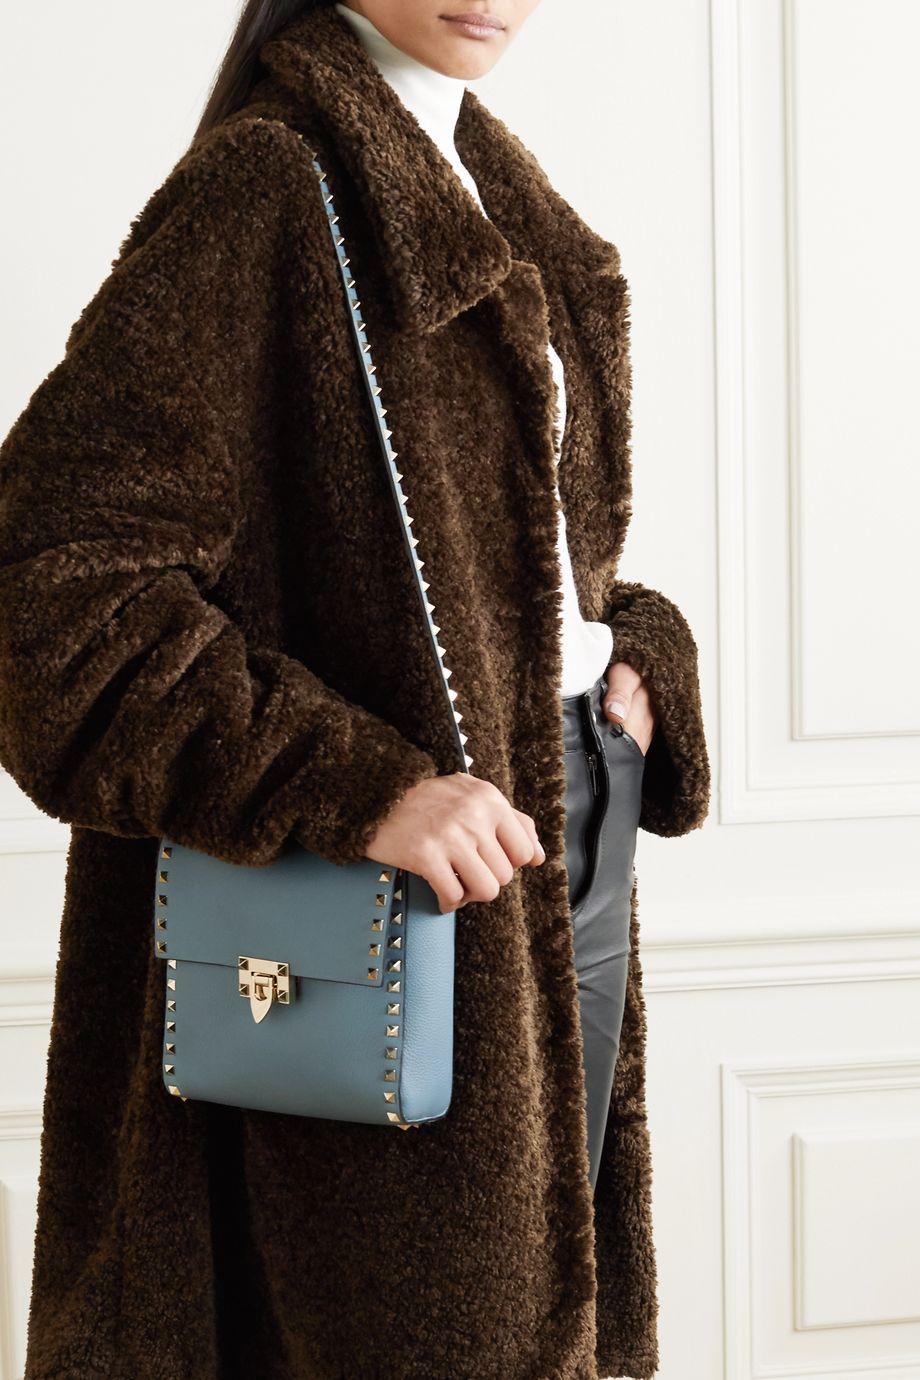 Valentino Valentino Garavani Rockstud small leather shoulder bag